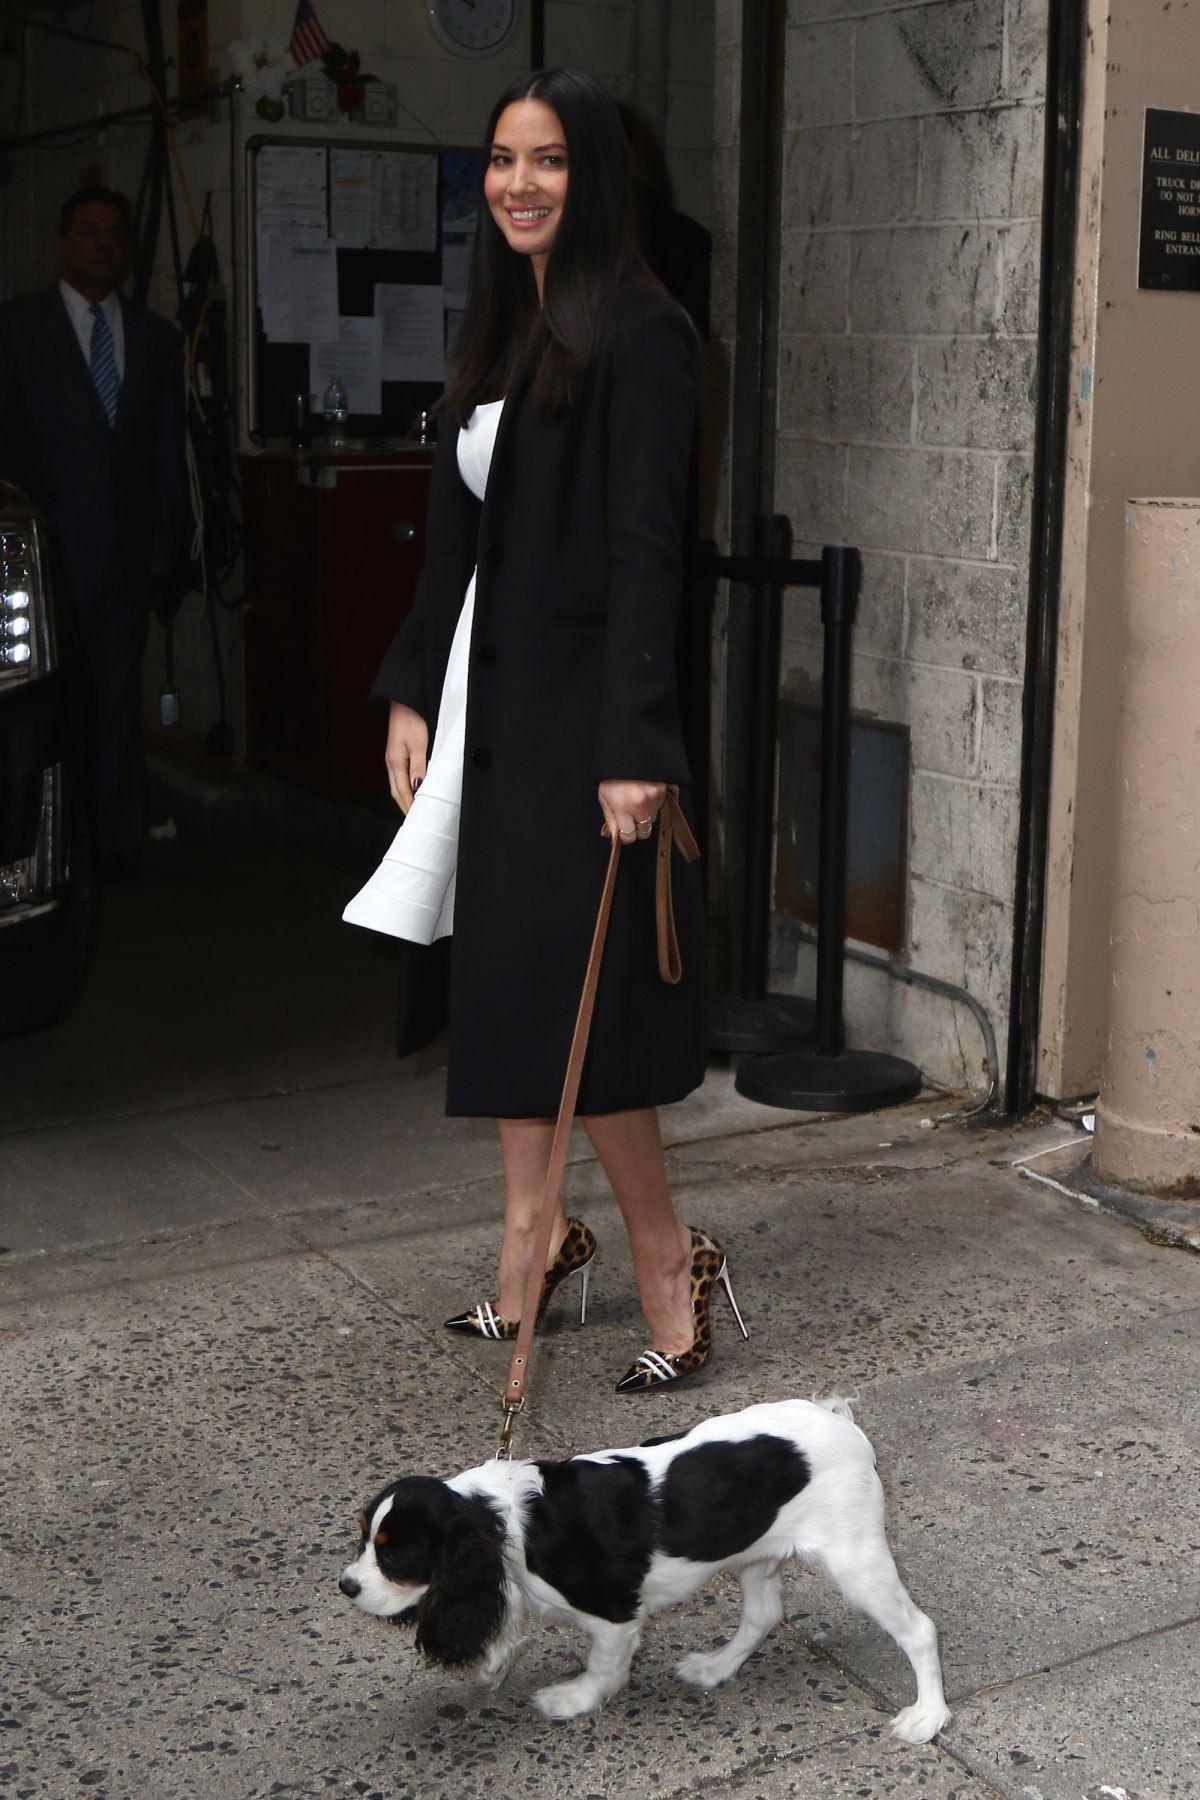 OLIVIA MUNN Walks Her Dog Out in New York - HawtCelebs | 1200 x 1800 jpeg 276kB